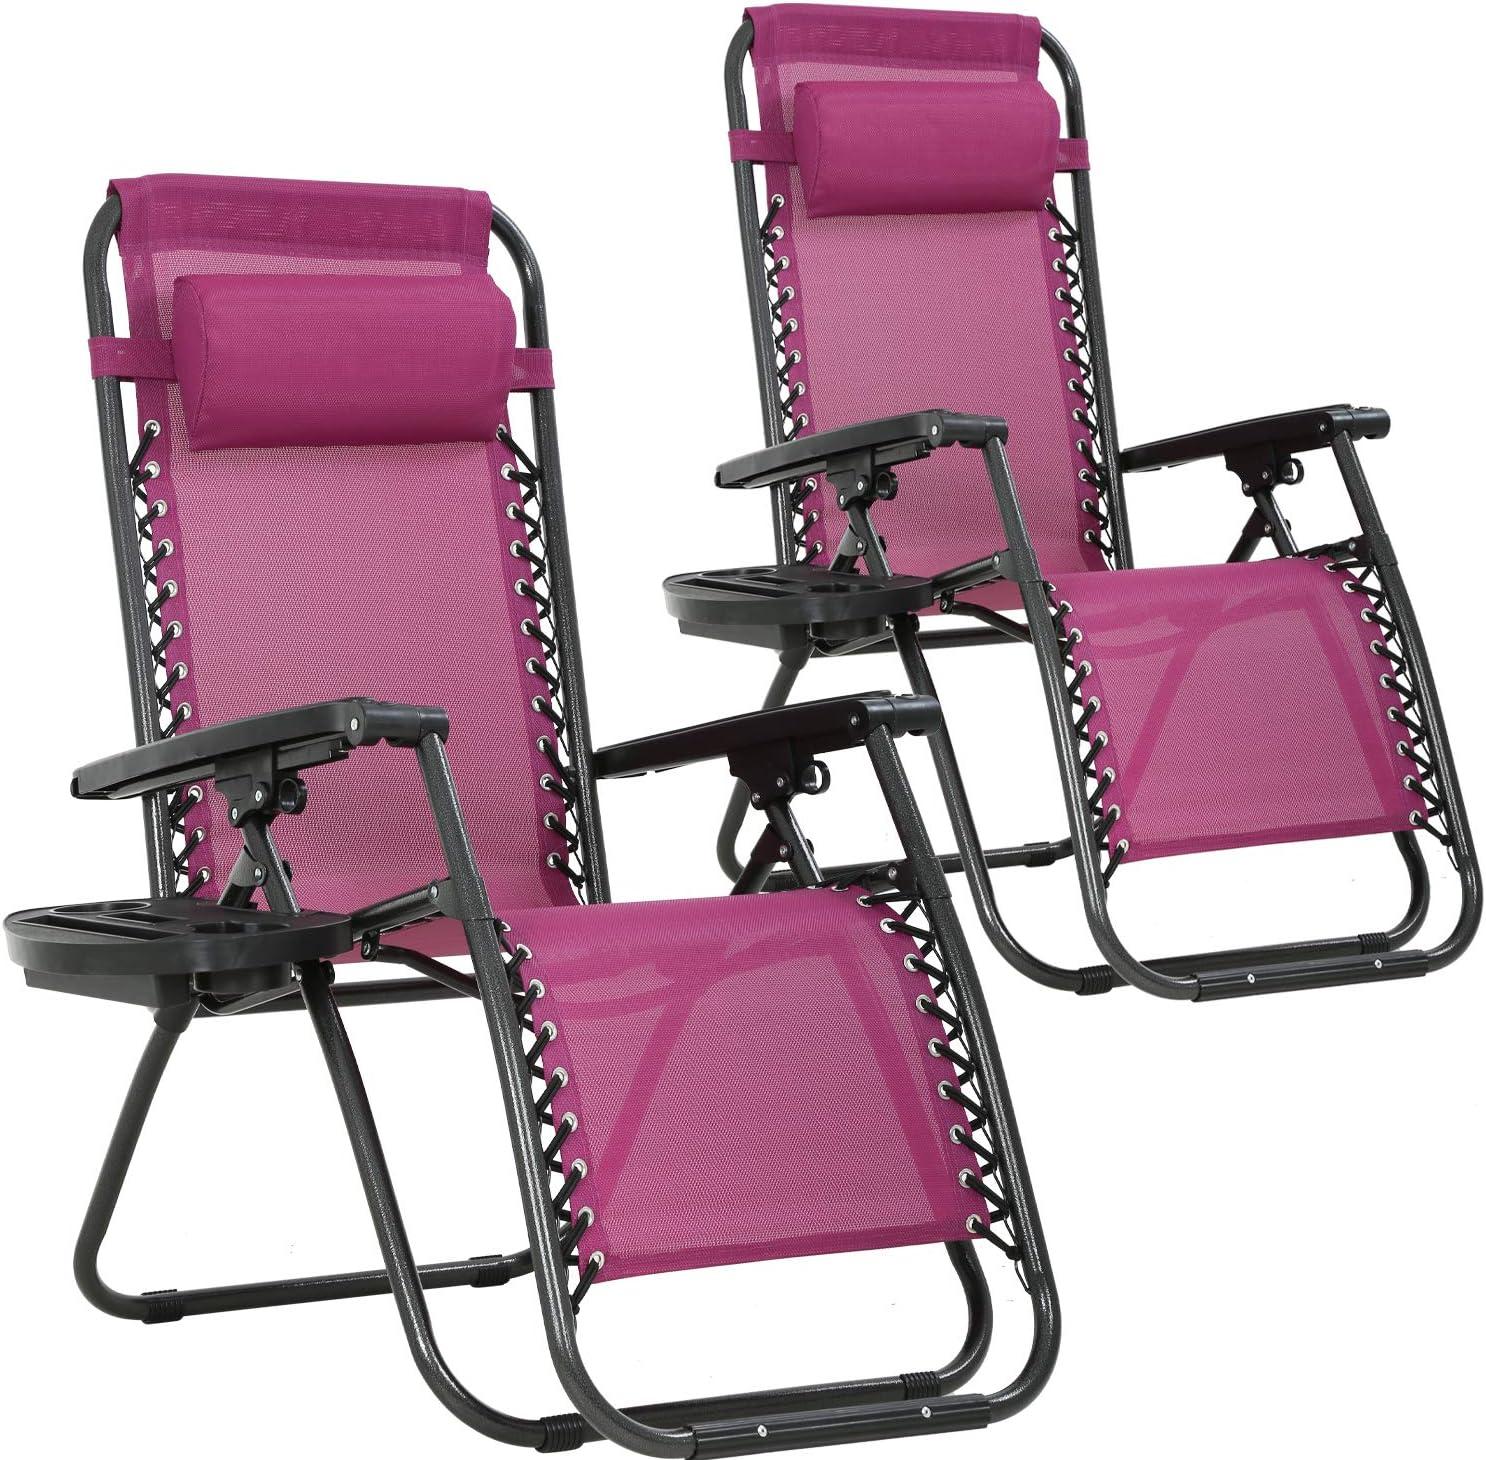 Zero Gravity Chair Patio Chairs Set of 2 Lawn Chair Outdoor Chair Anti Recliner Chair Deck Chairs Folding Lounge Chair Camping Chairs Beach Chairs Pool Chair